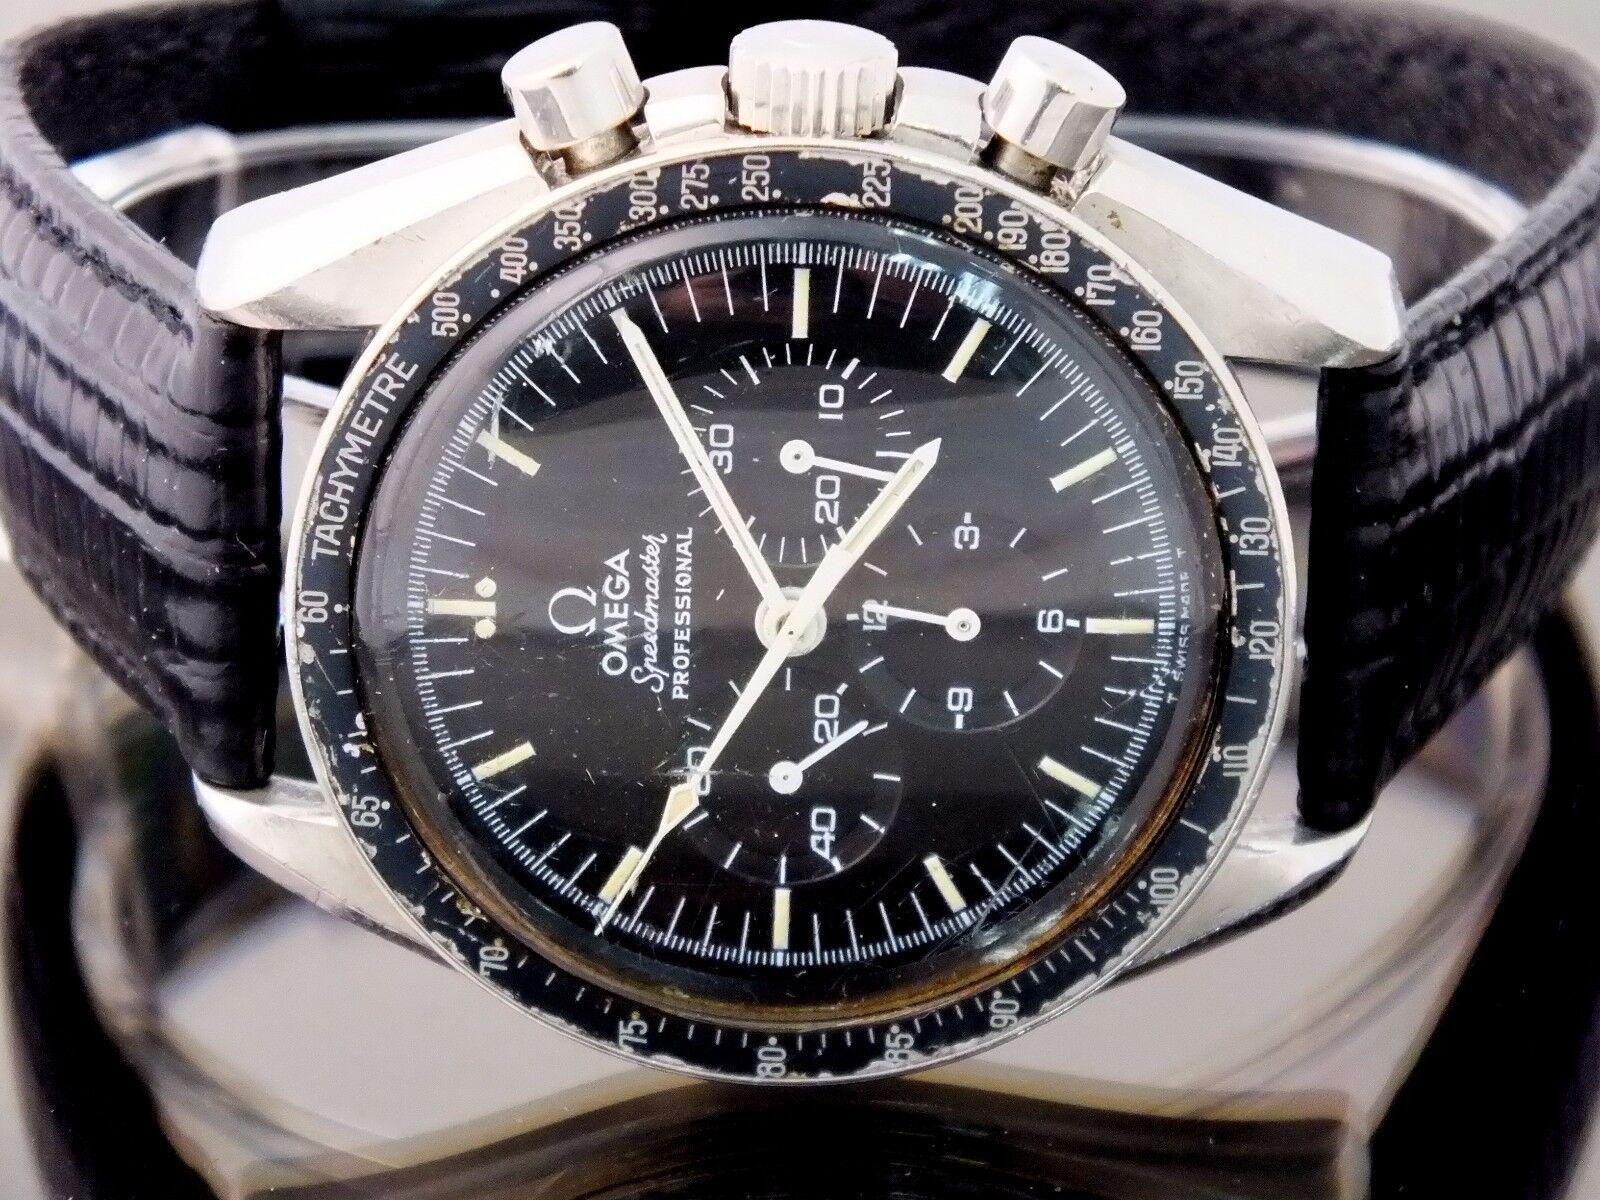 omega watch speedmaster professional nasa qualified no 145027 74 st tachymetre ebay. Black Bedroom Furniture Sets. Home Design Ideas